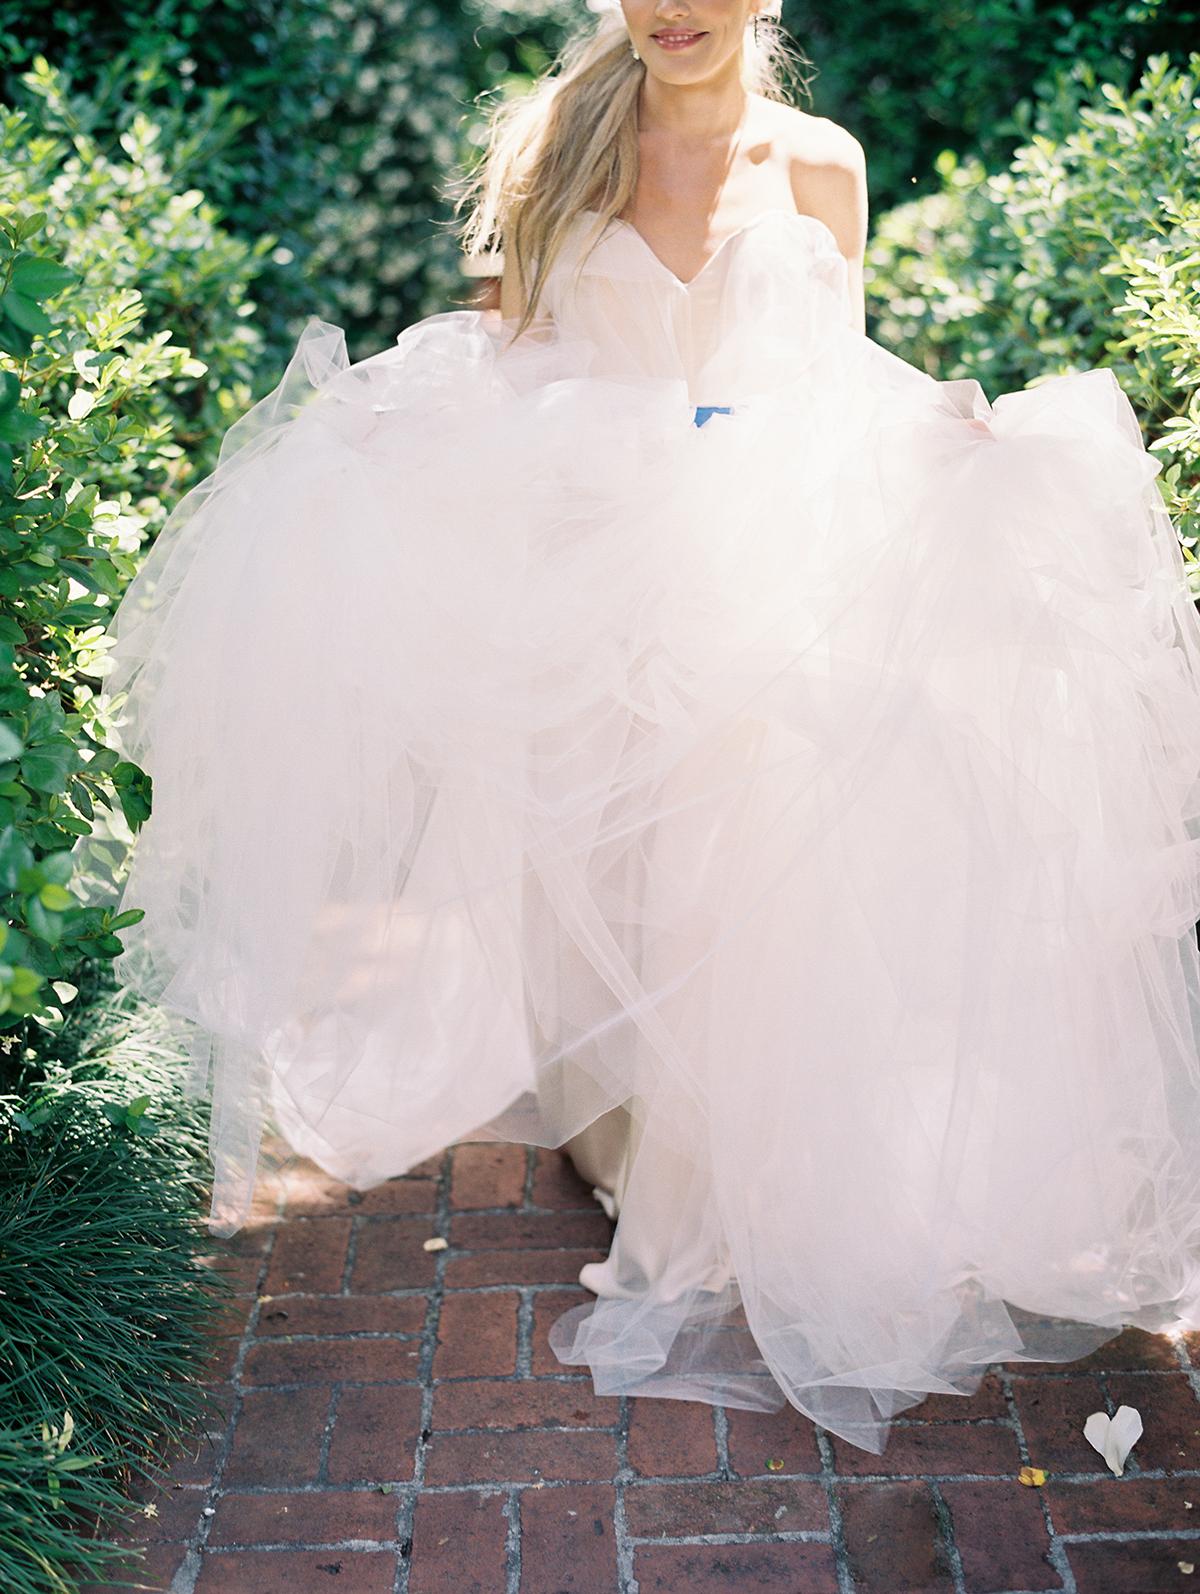 Carol-Hannah-Gown-Tulle-Skirt.jpg